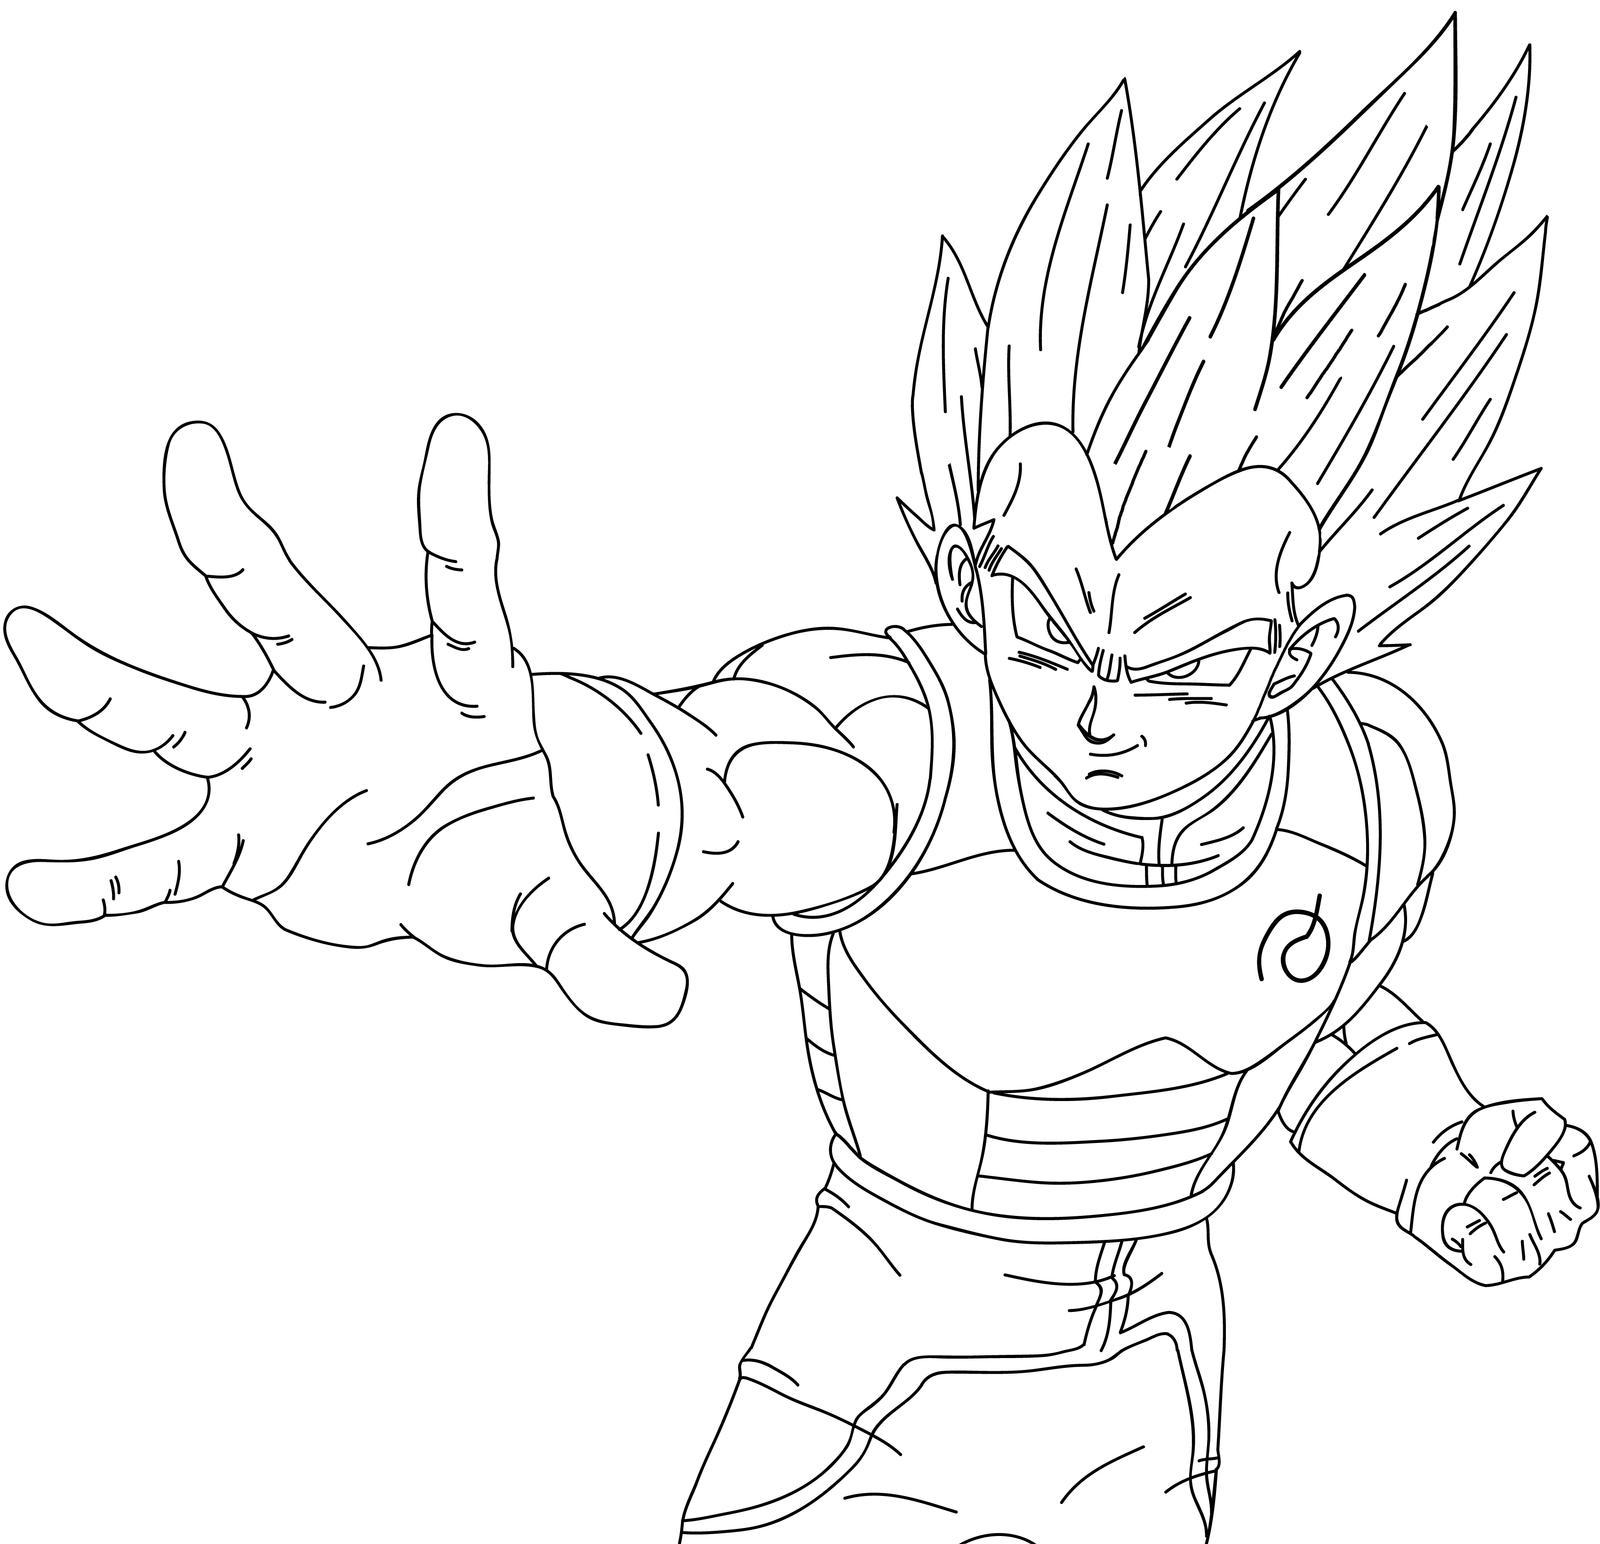 Goku Ssgss Drawing At Getdrawingscom Free For Personal Use Goku